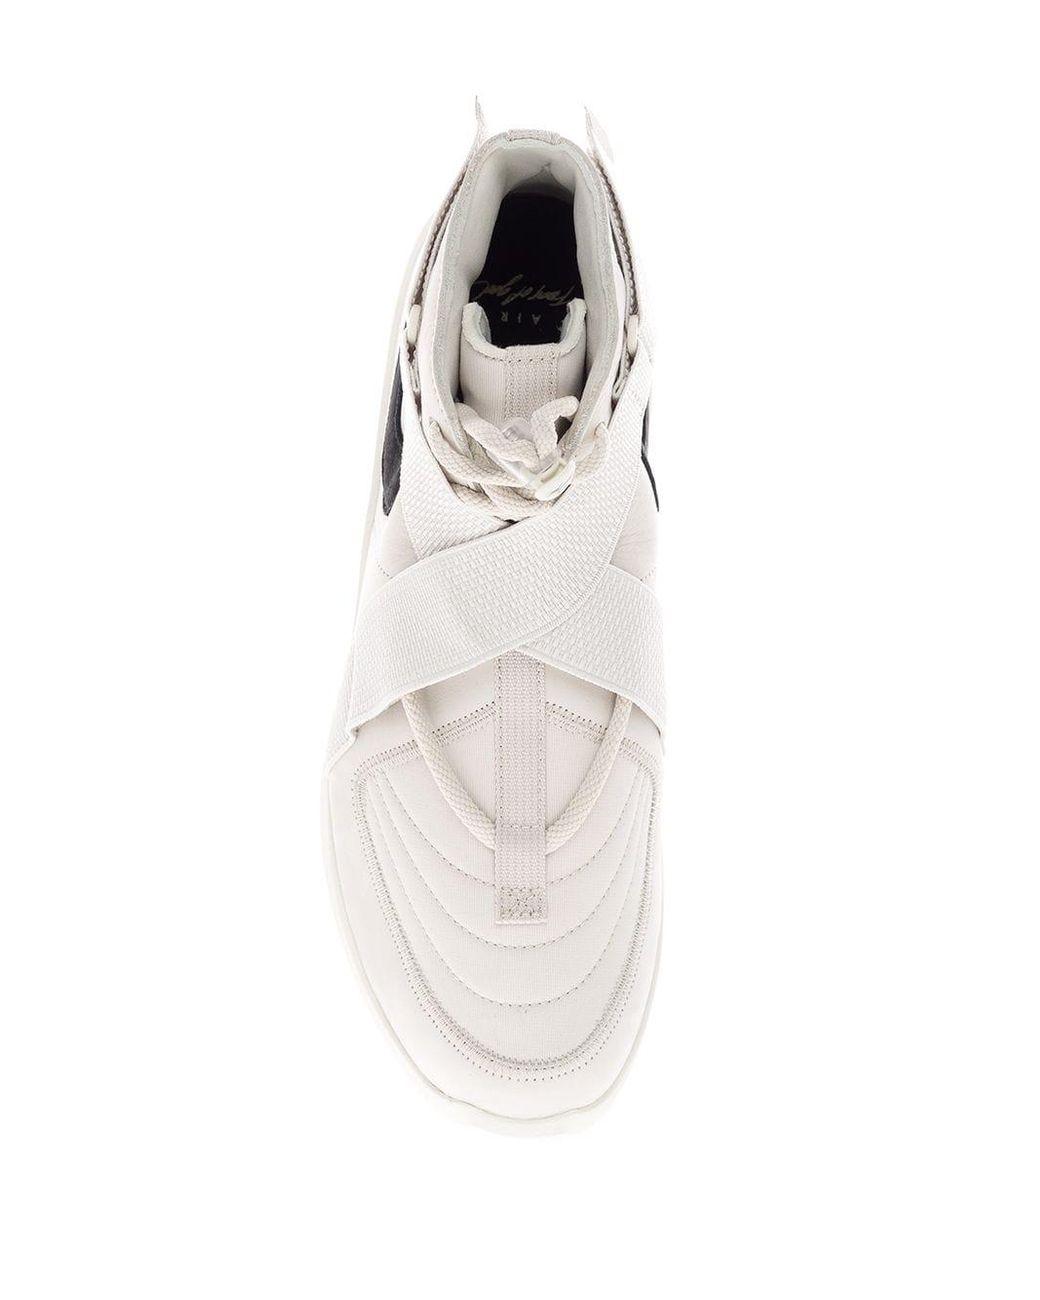 Nike Cross Strap Sneakers in White for